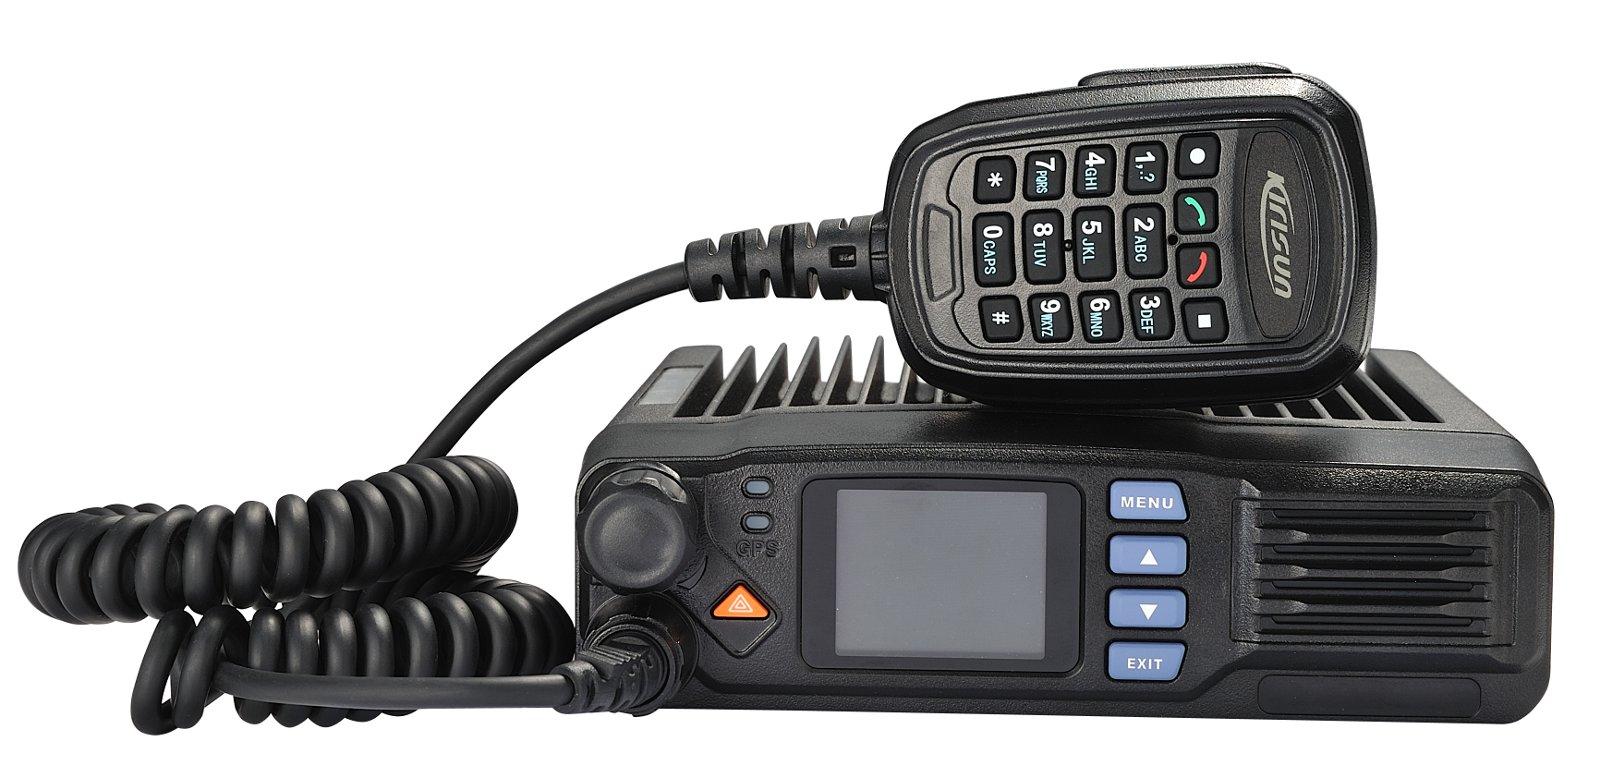 MØFOX Ham Radio OperatorMain menuDMR Digital Mobile Radio